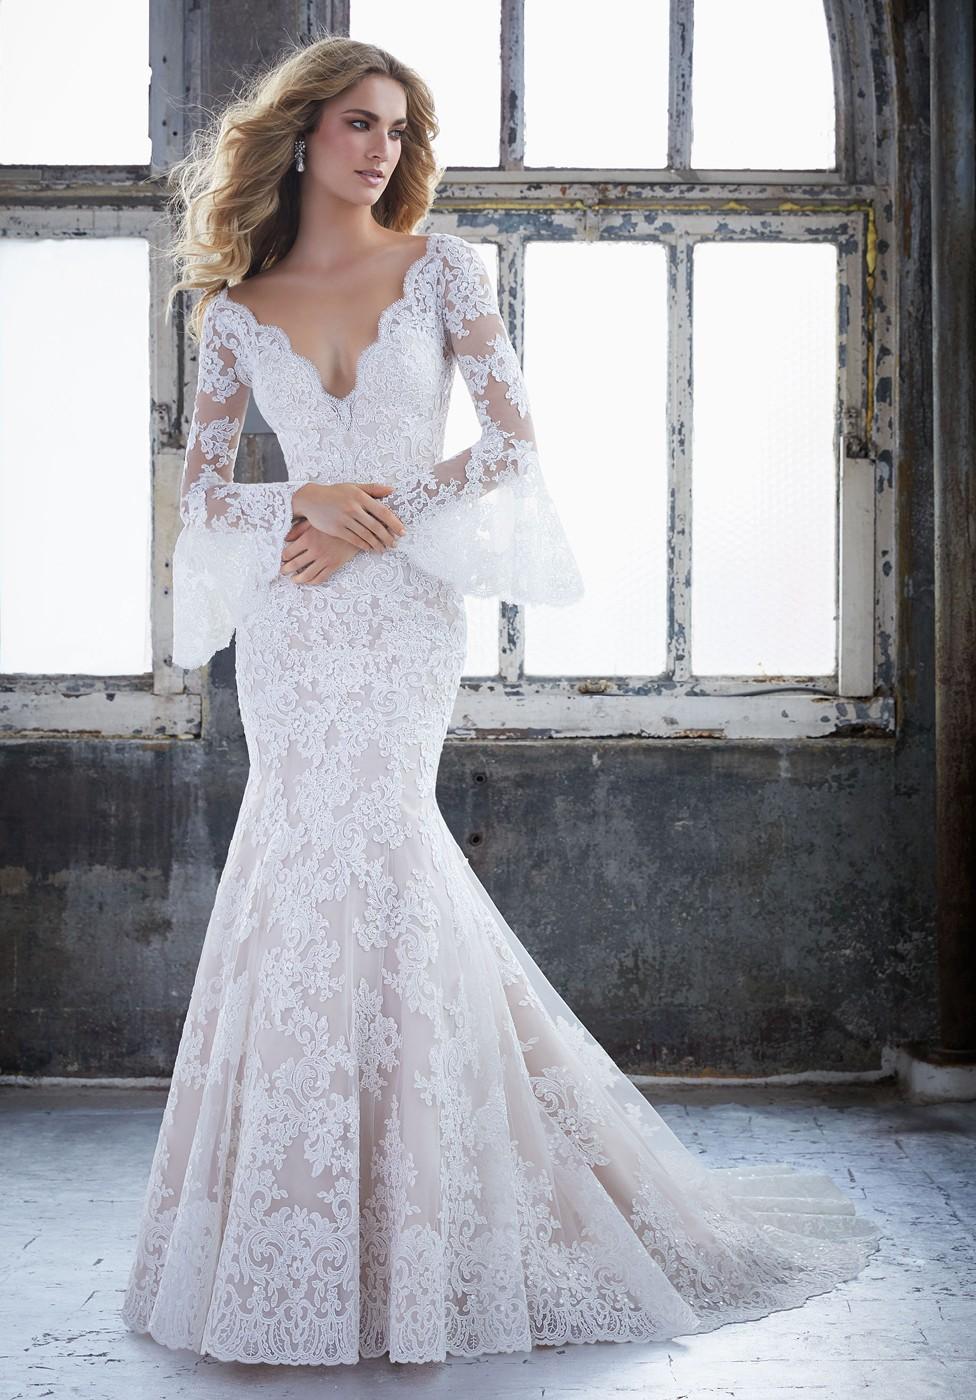 بالصور فساتين عرايس فخمه , افخم فستان عروسه يجنن 4398 11